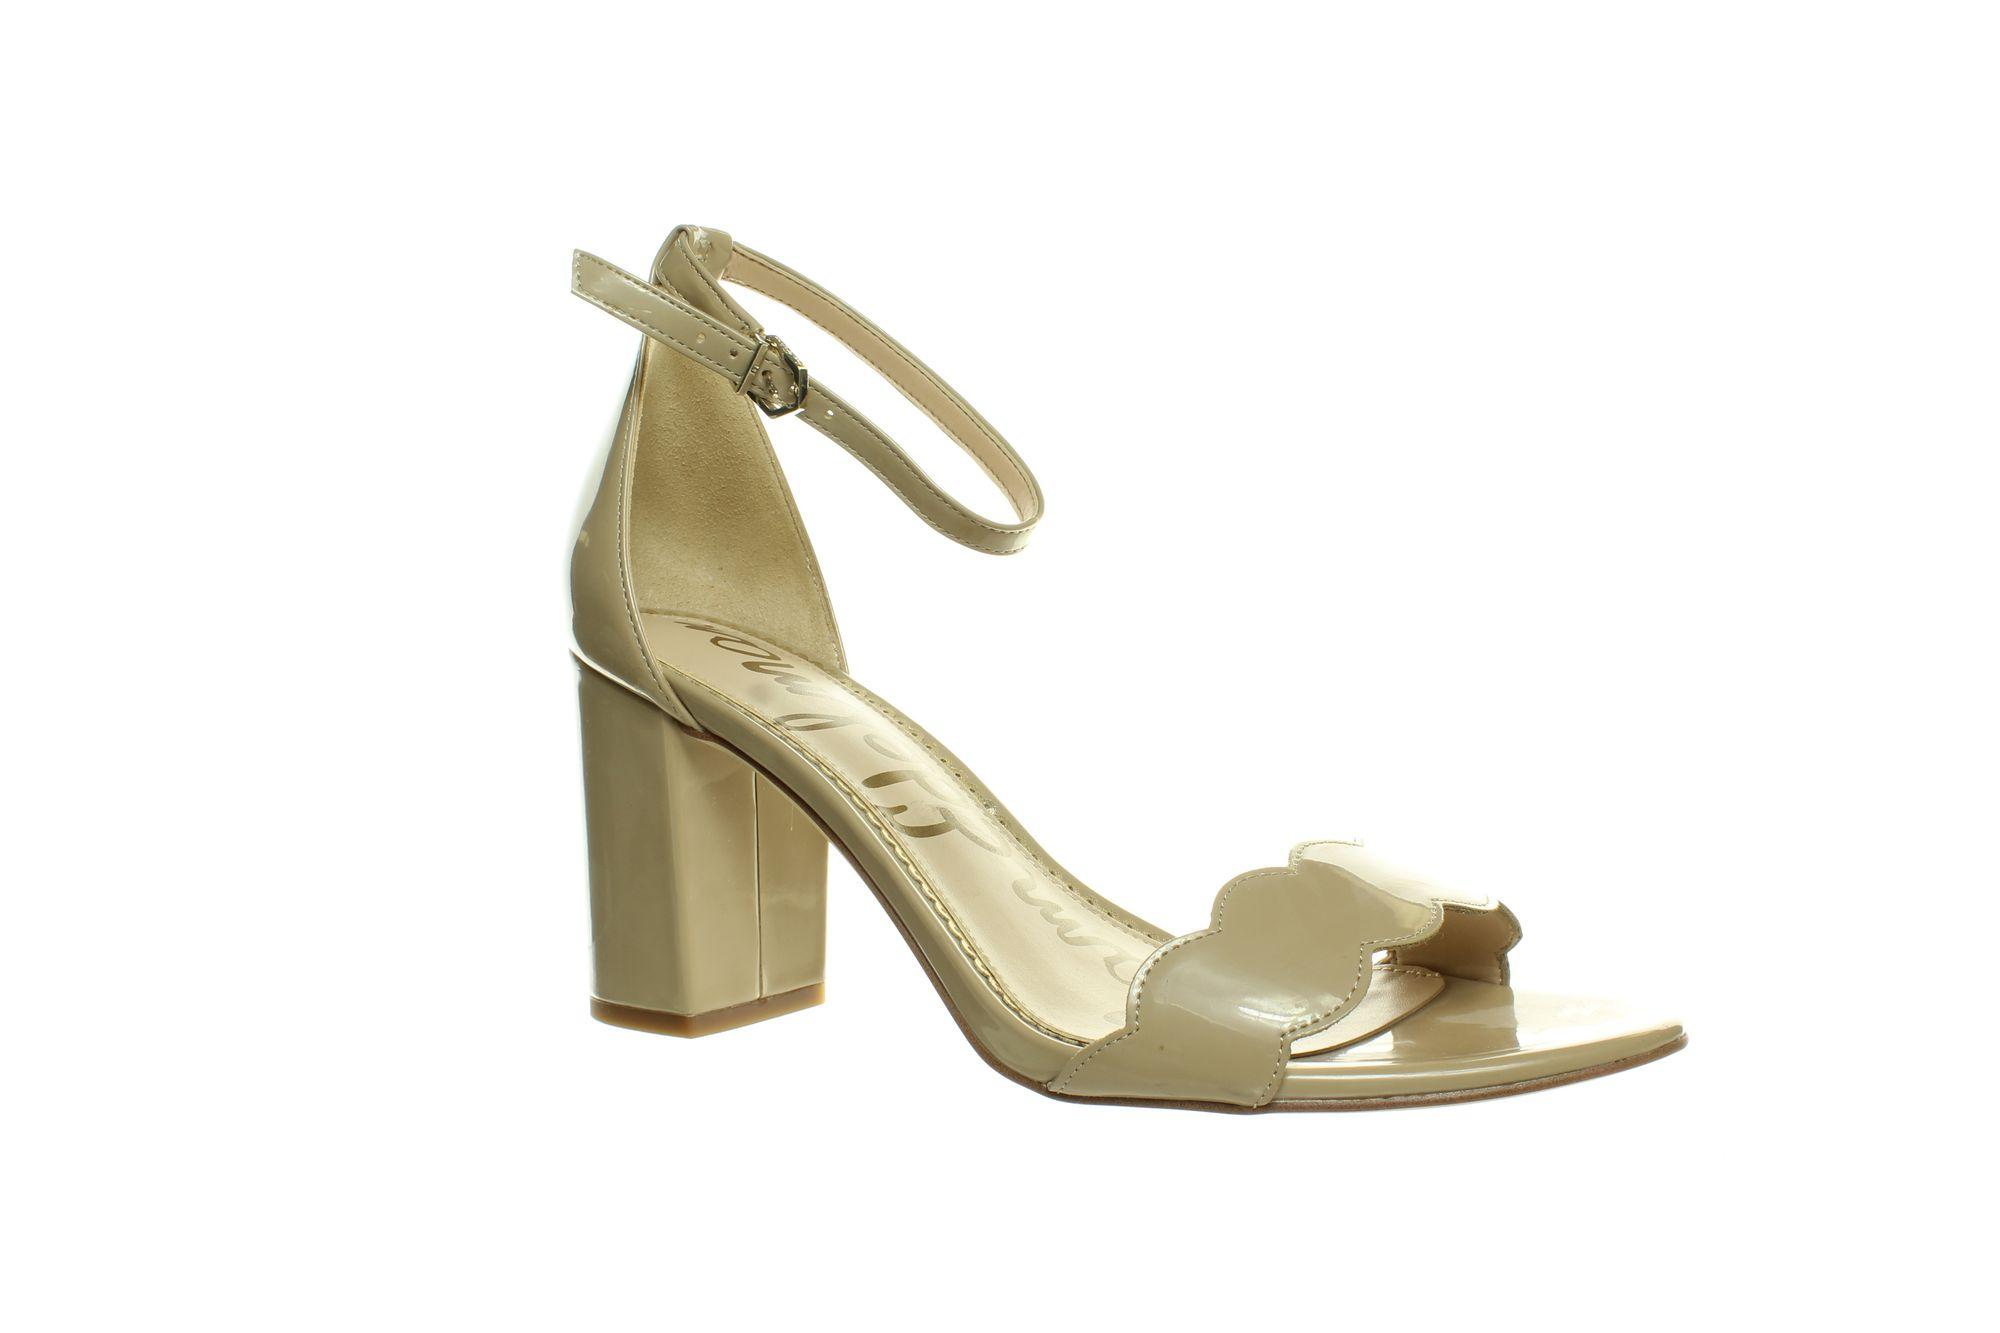 Sam Edelman Womens Ariella Beige Nude Patent Ankle Strap